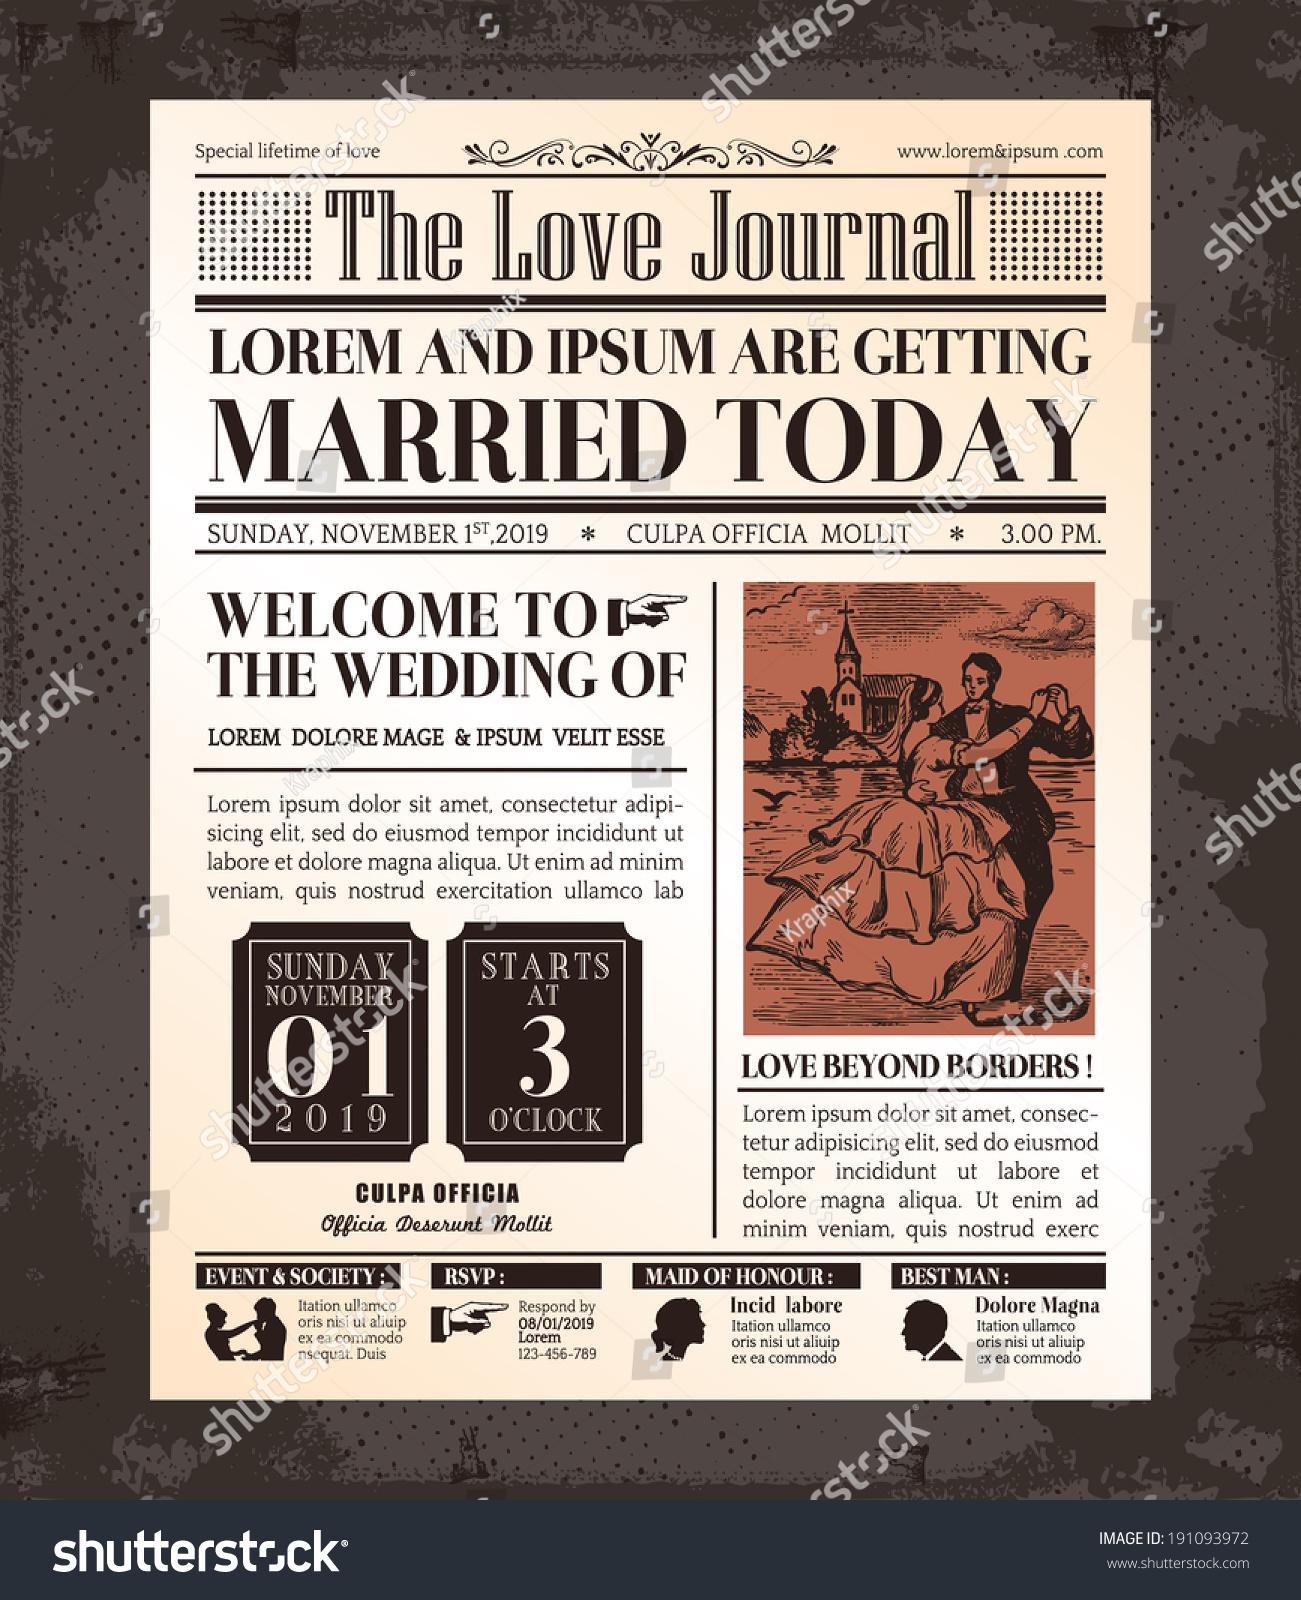 Vintage Newspaper Journal Wedding Invitation Vector Vector – Vintage Newspaper